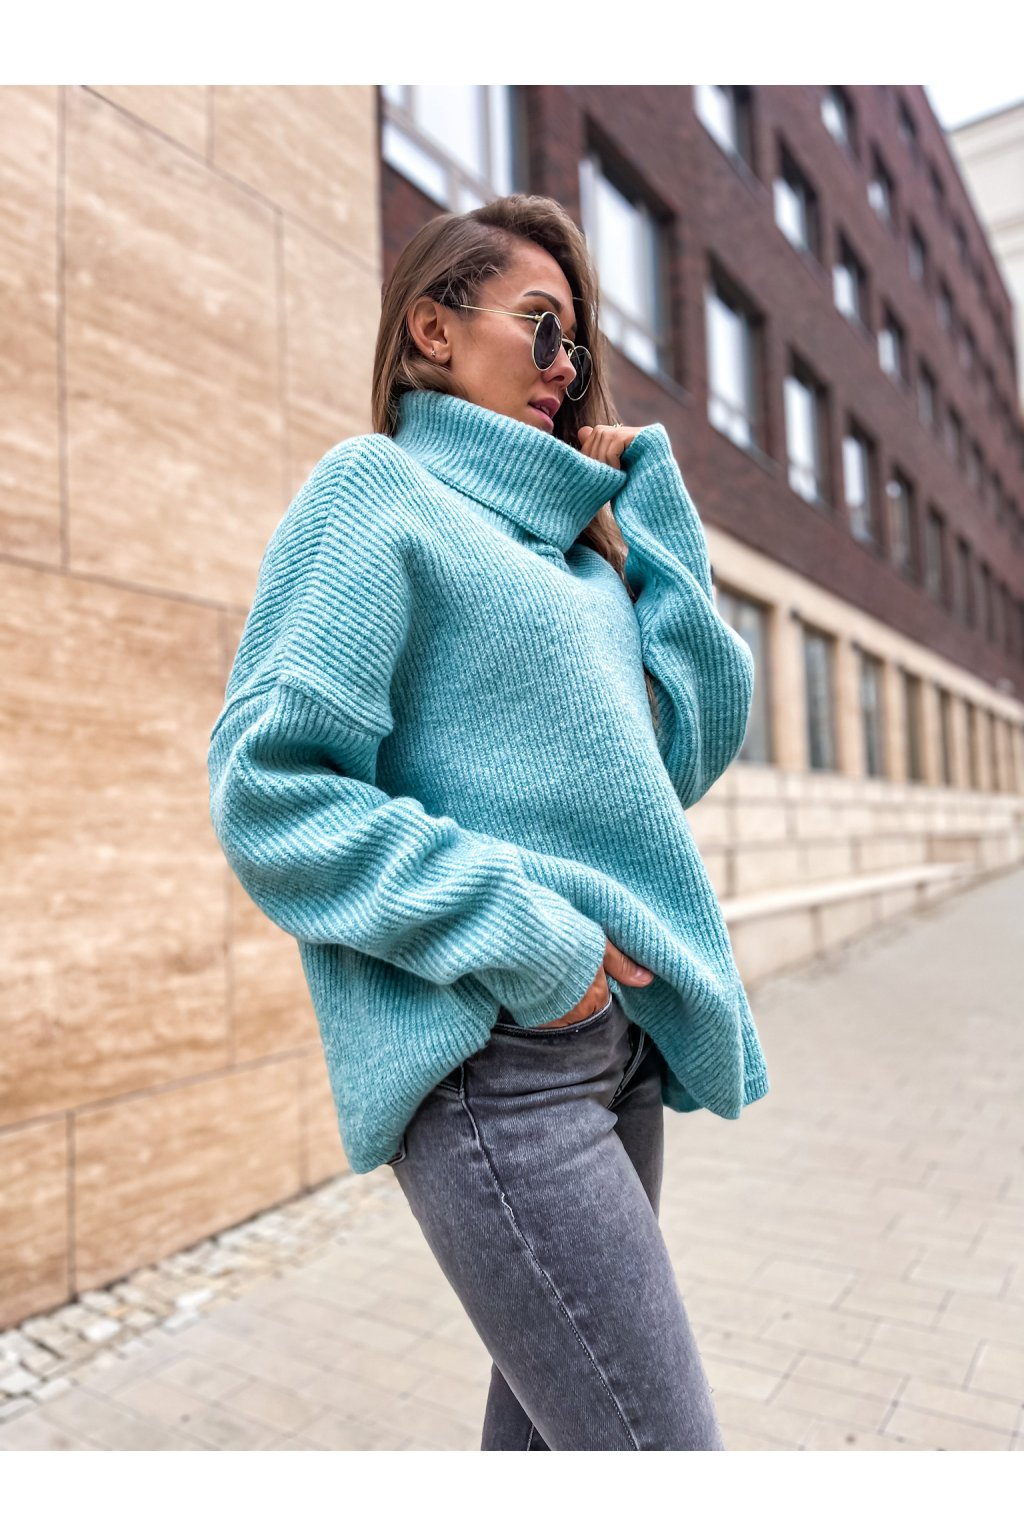 damsky svetr s rolakem ocean blue eshopat cz 7